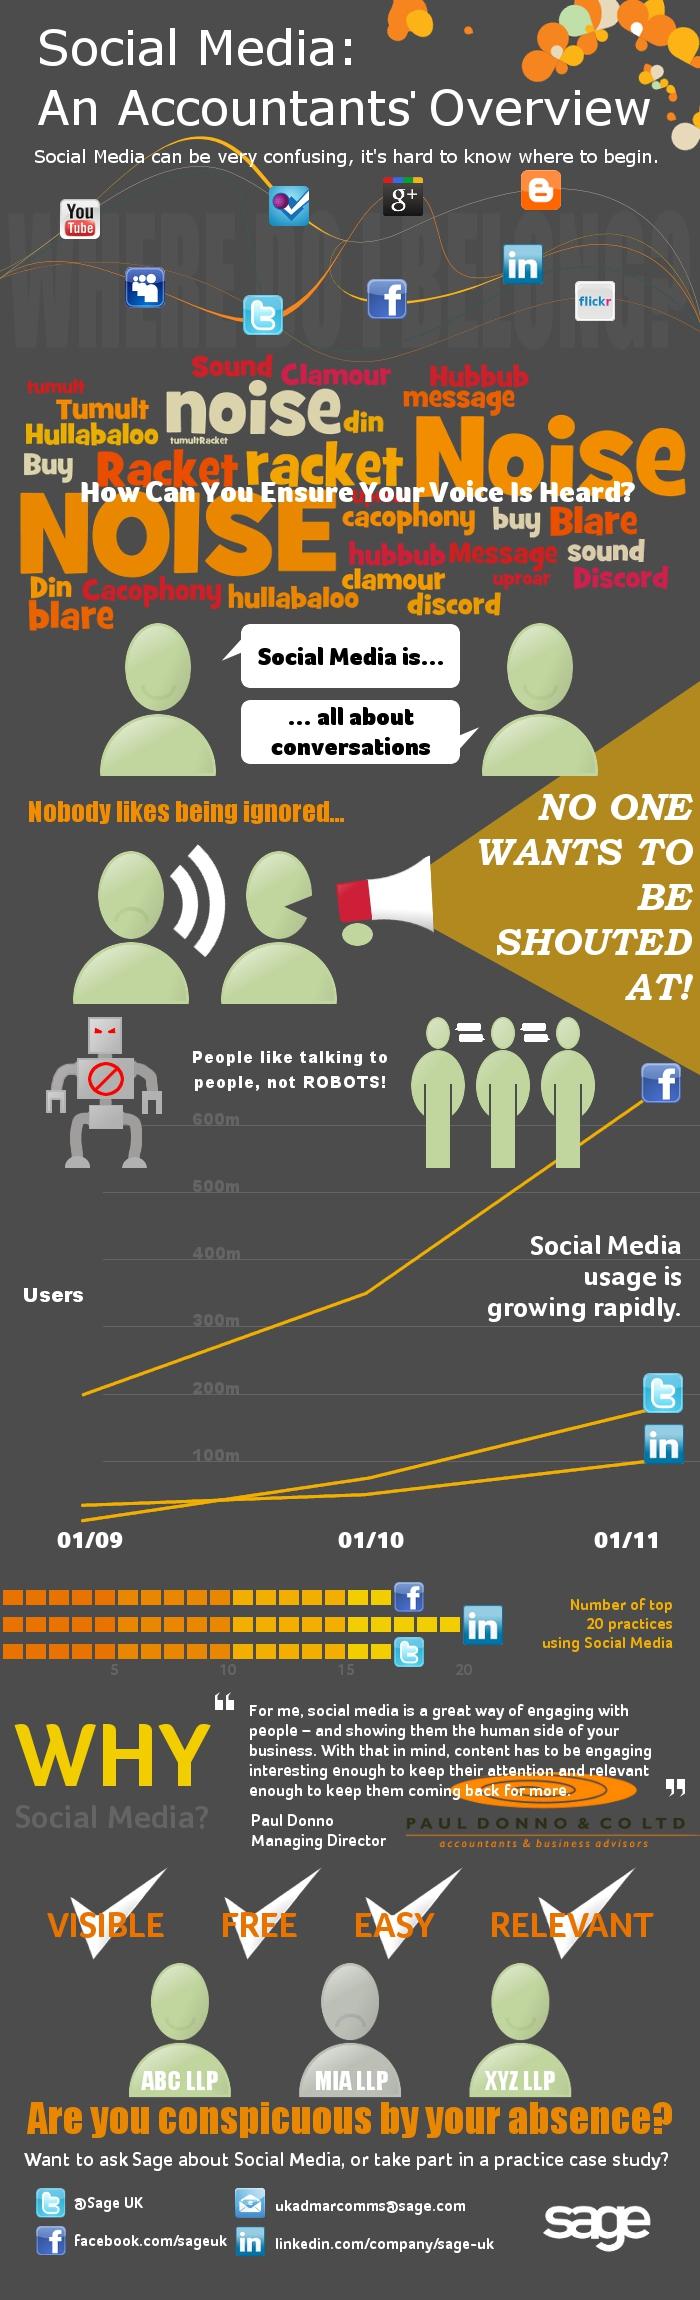 Social Media: An accountants' overview